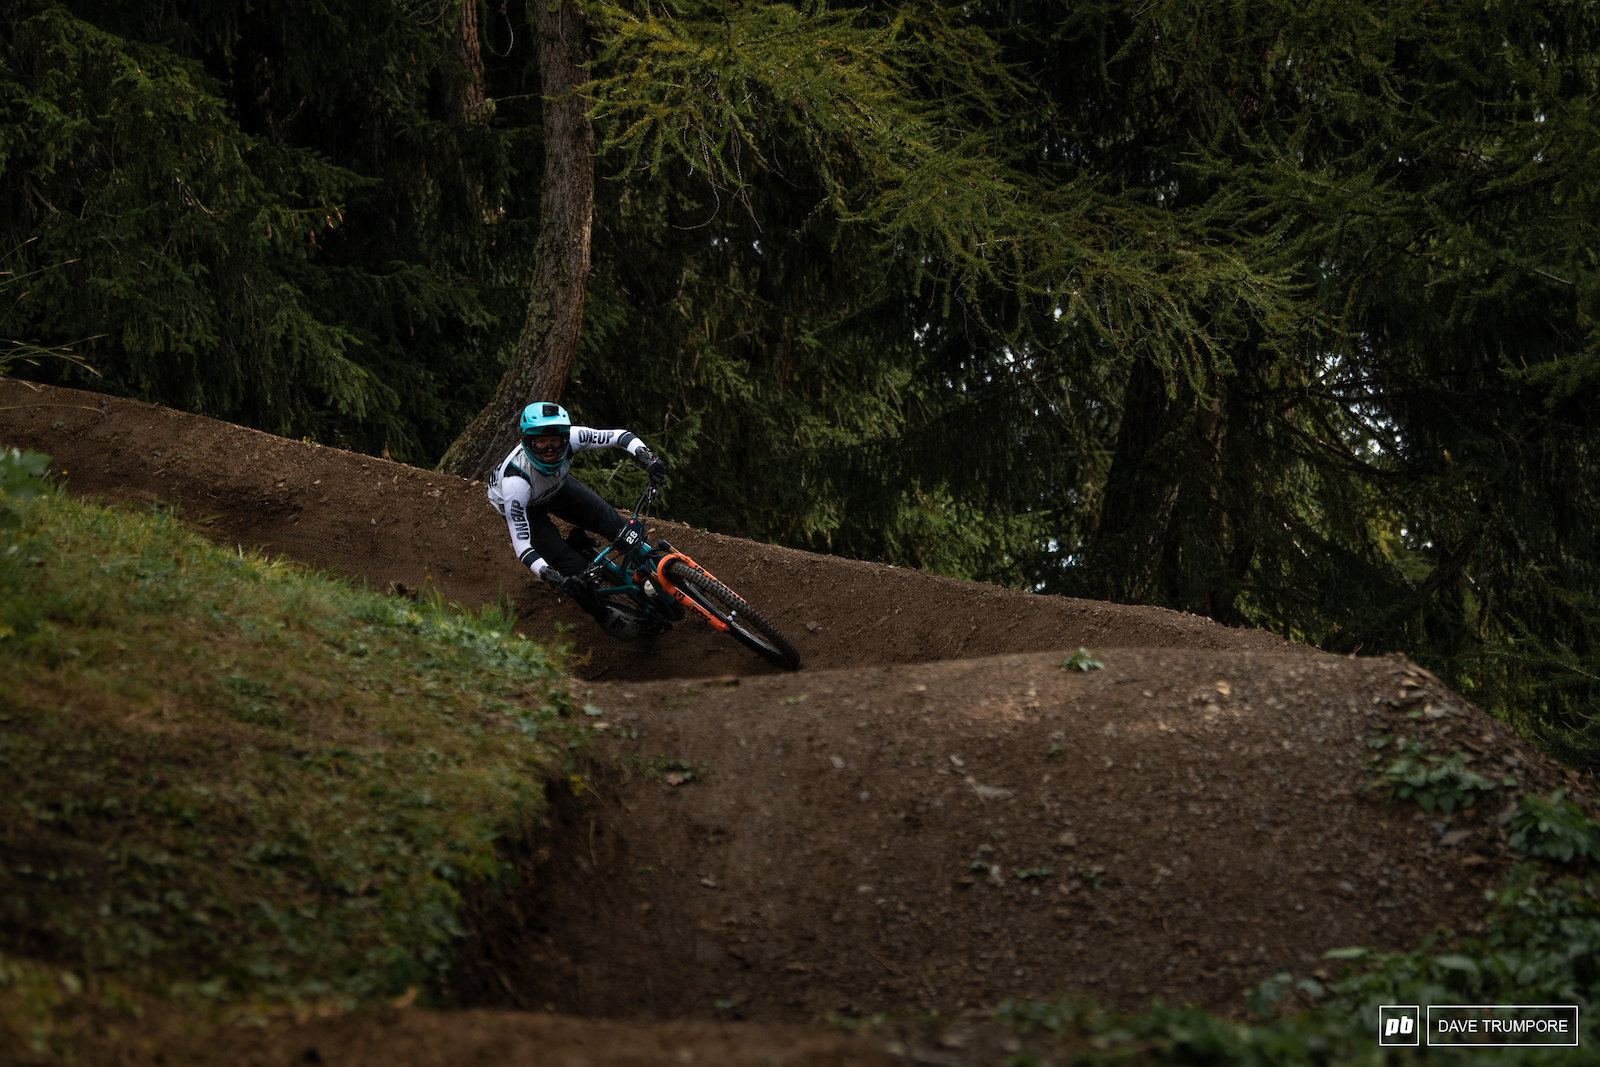 Kasper Wooley looking to carry over the speed he showed last week in Loudenvielle